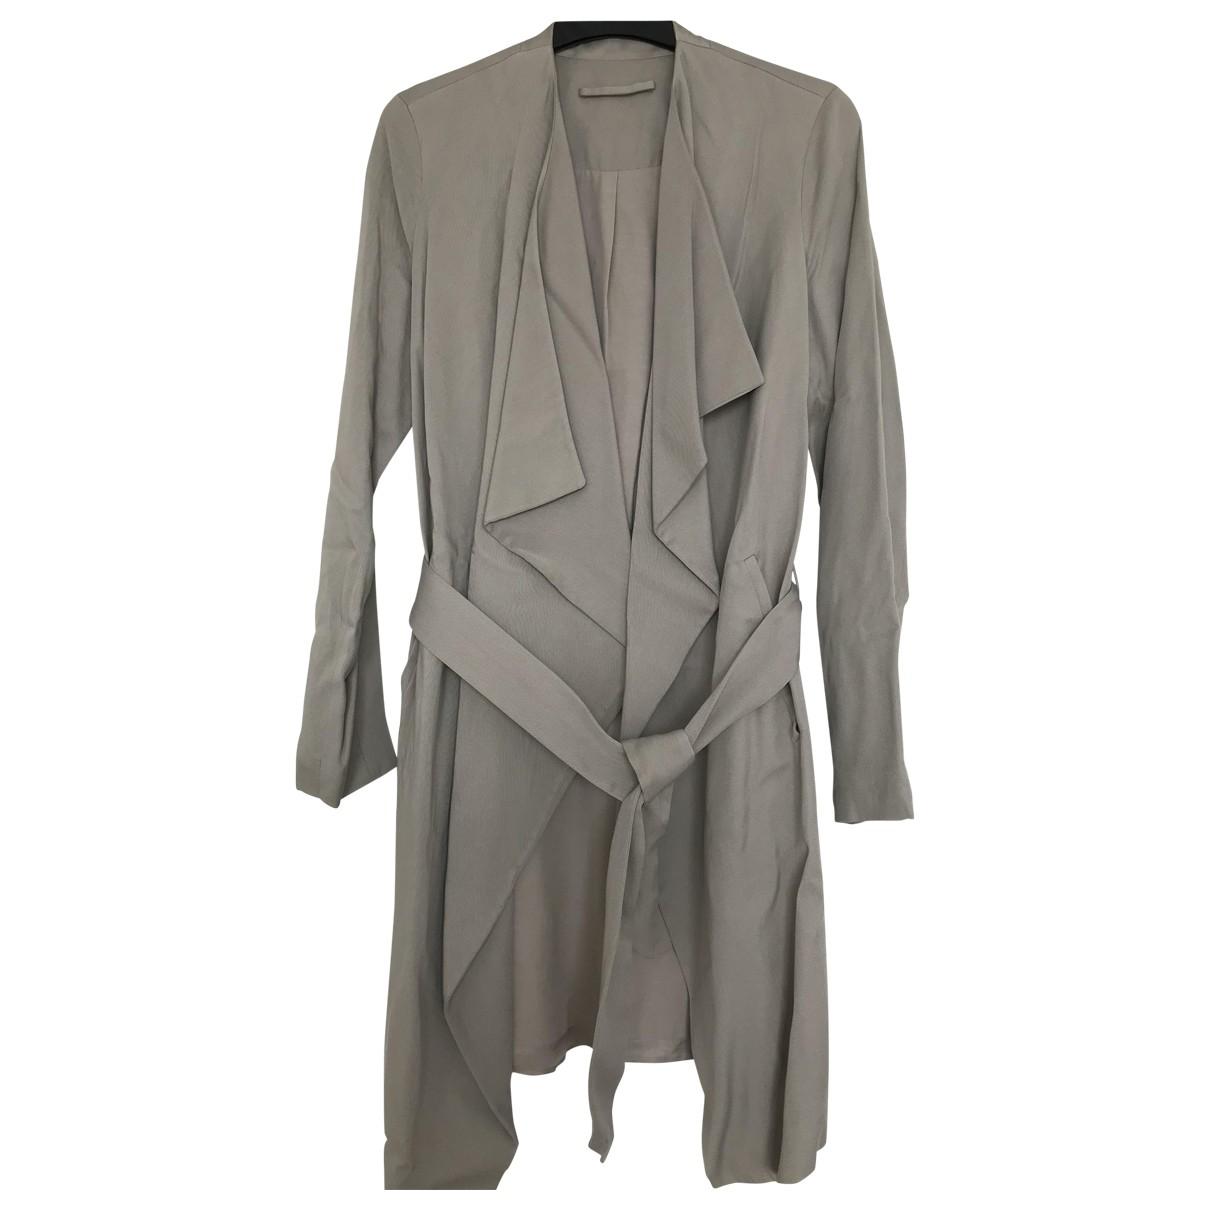 All Saints \N Beige Cotton coat for Women 4 UK